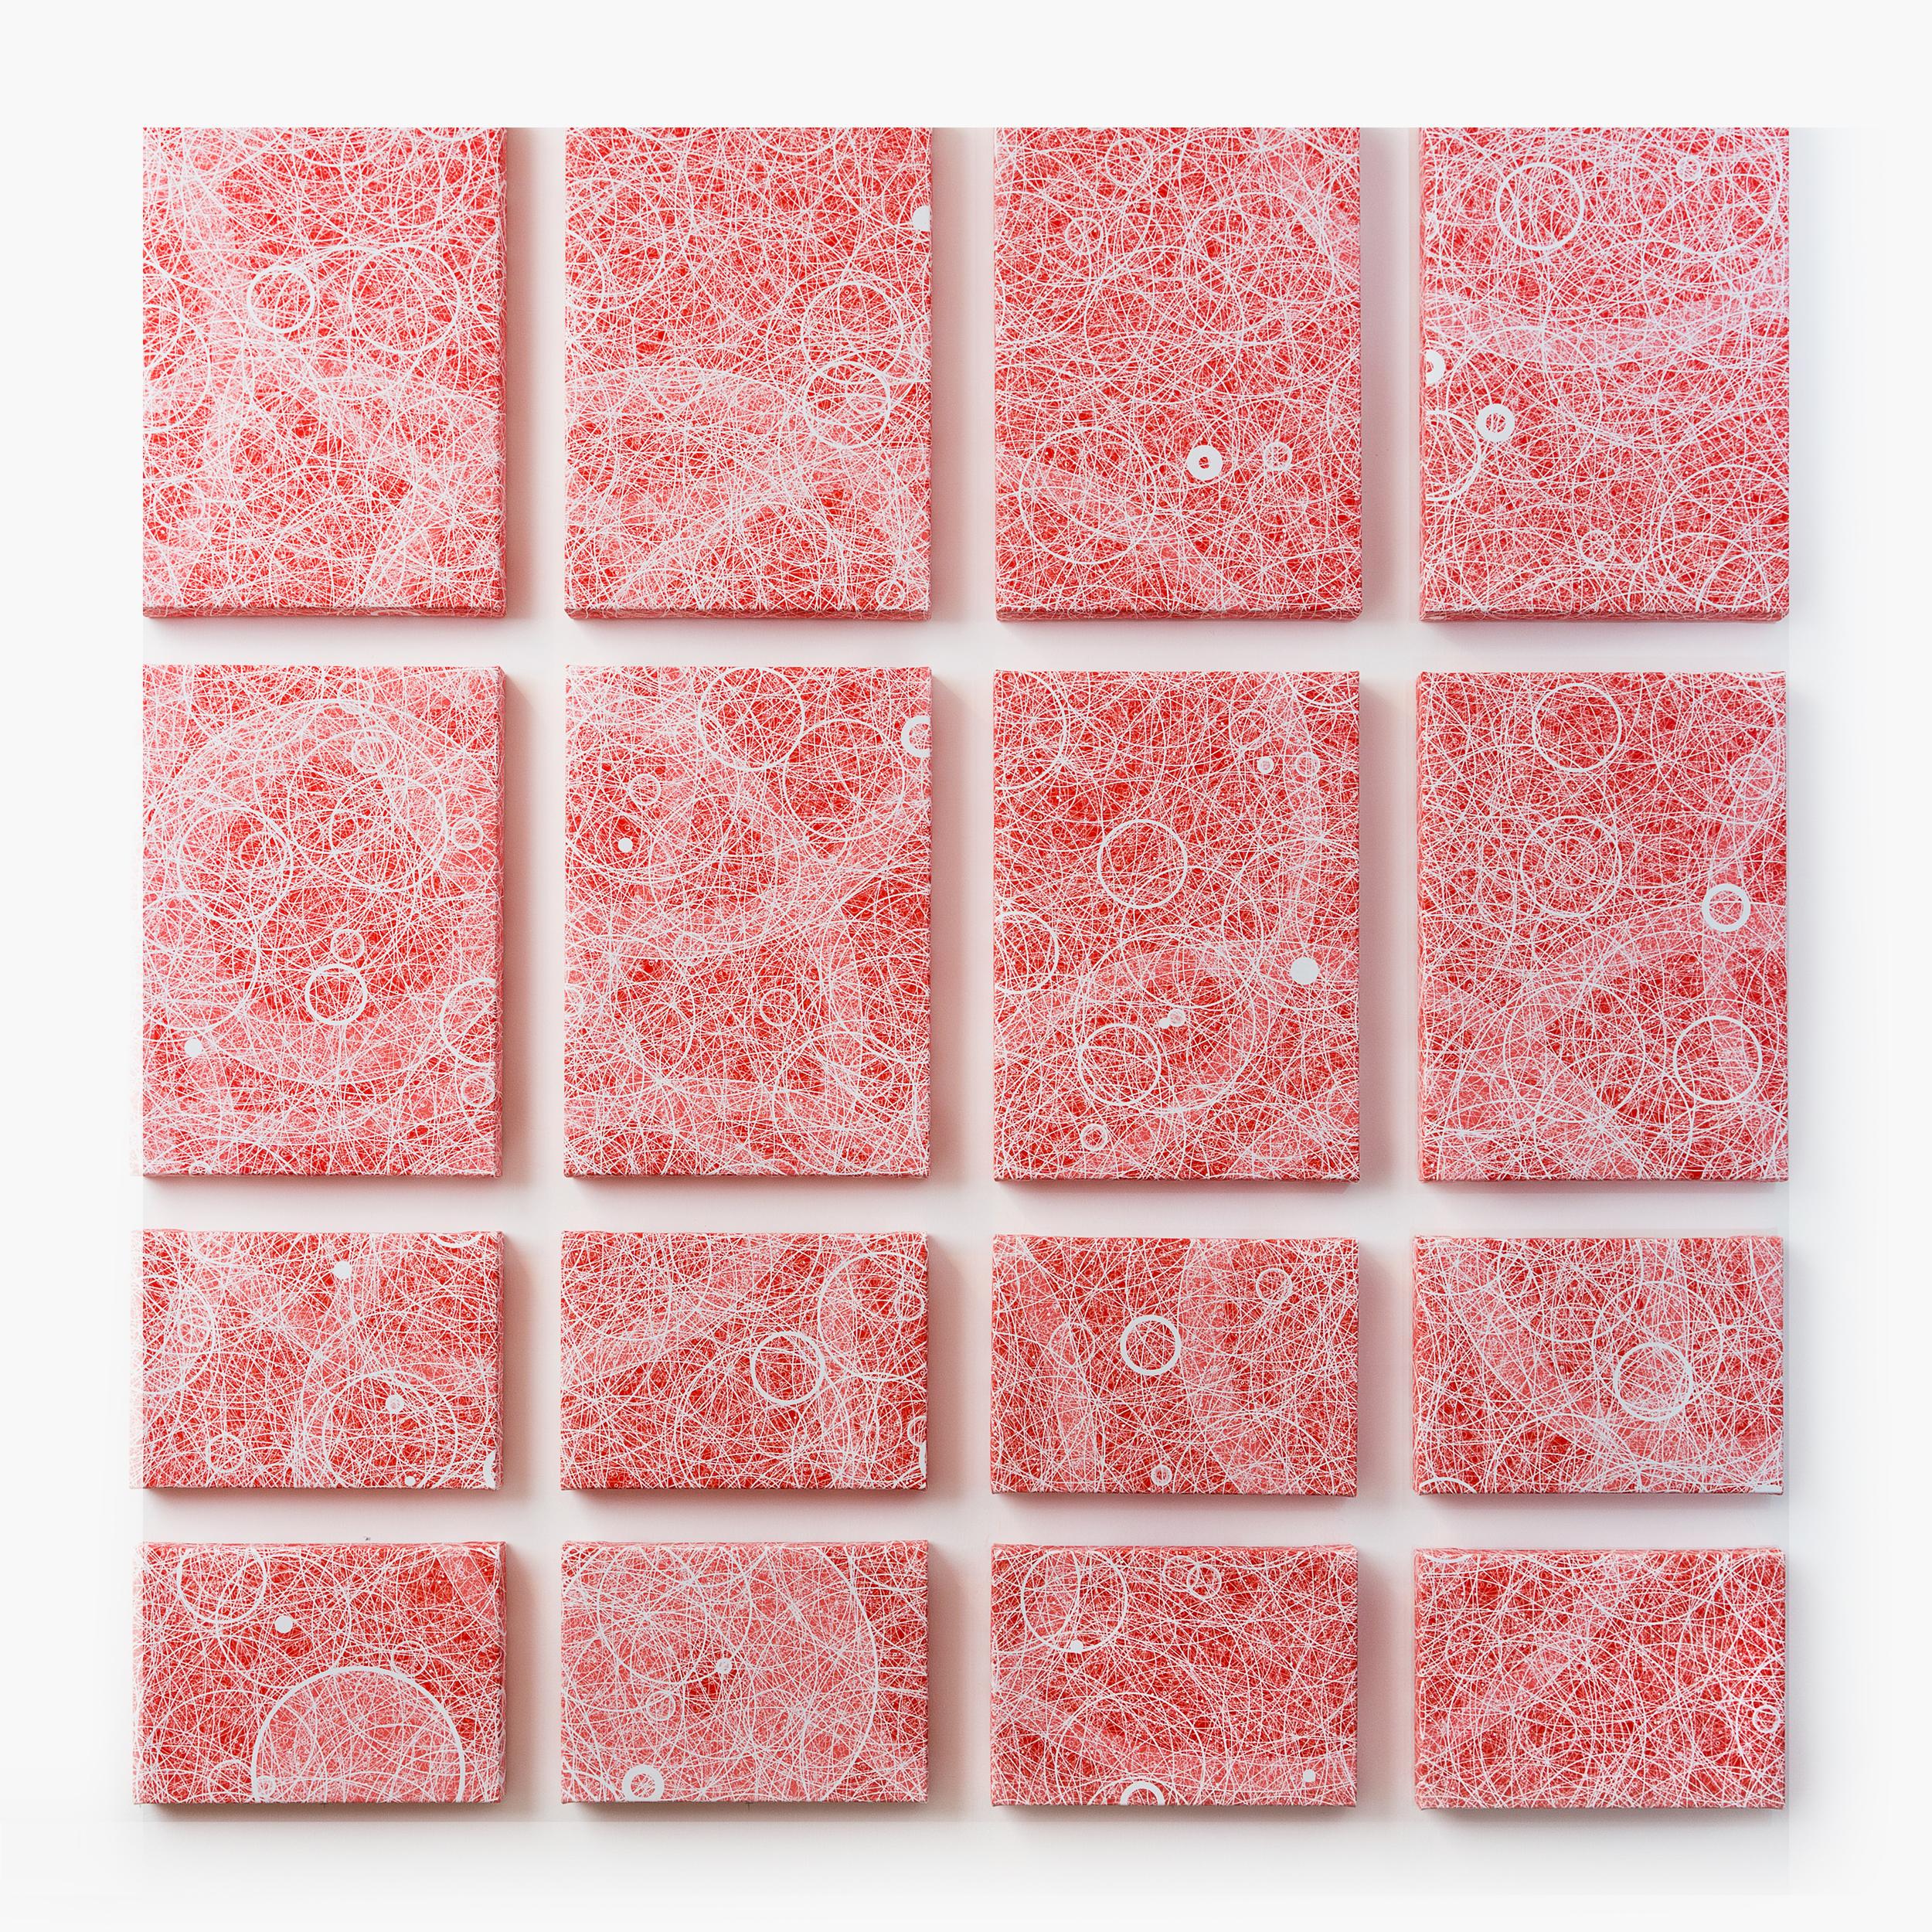 """Flatness, Wall 3""   Quadrant 1 (top left), 2 (top right), 3 (bottom left), 4 (bottom right)""   Giclée on Canvas   133.8 x 141 cm each   2015"